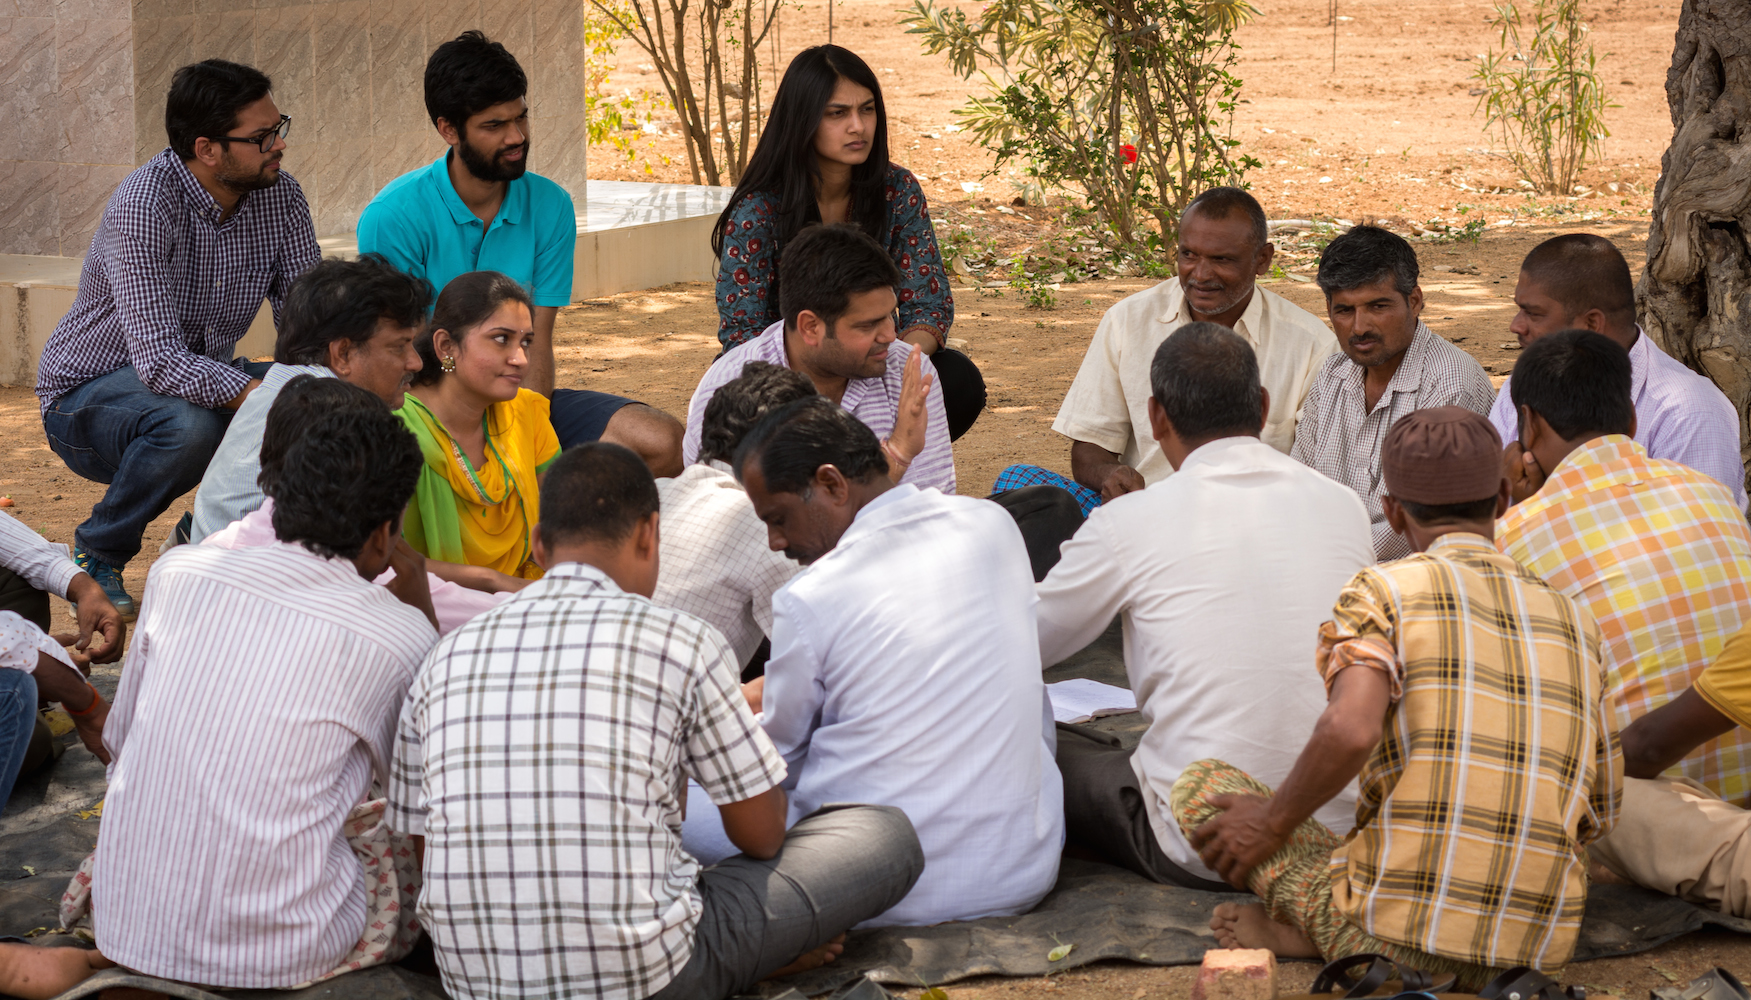 Kheyti staff speaking with Indian farmers. Image courtesy of Kheyti.